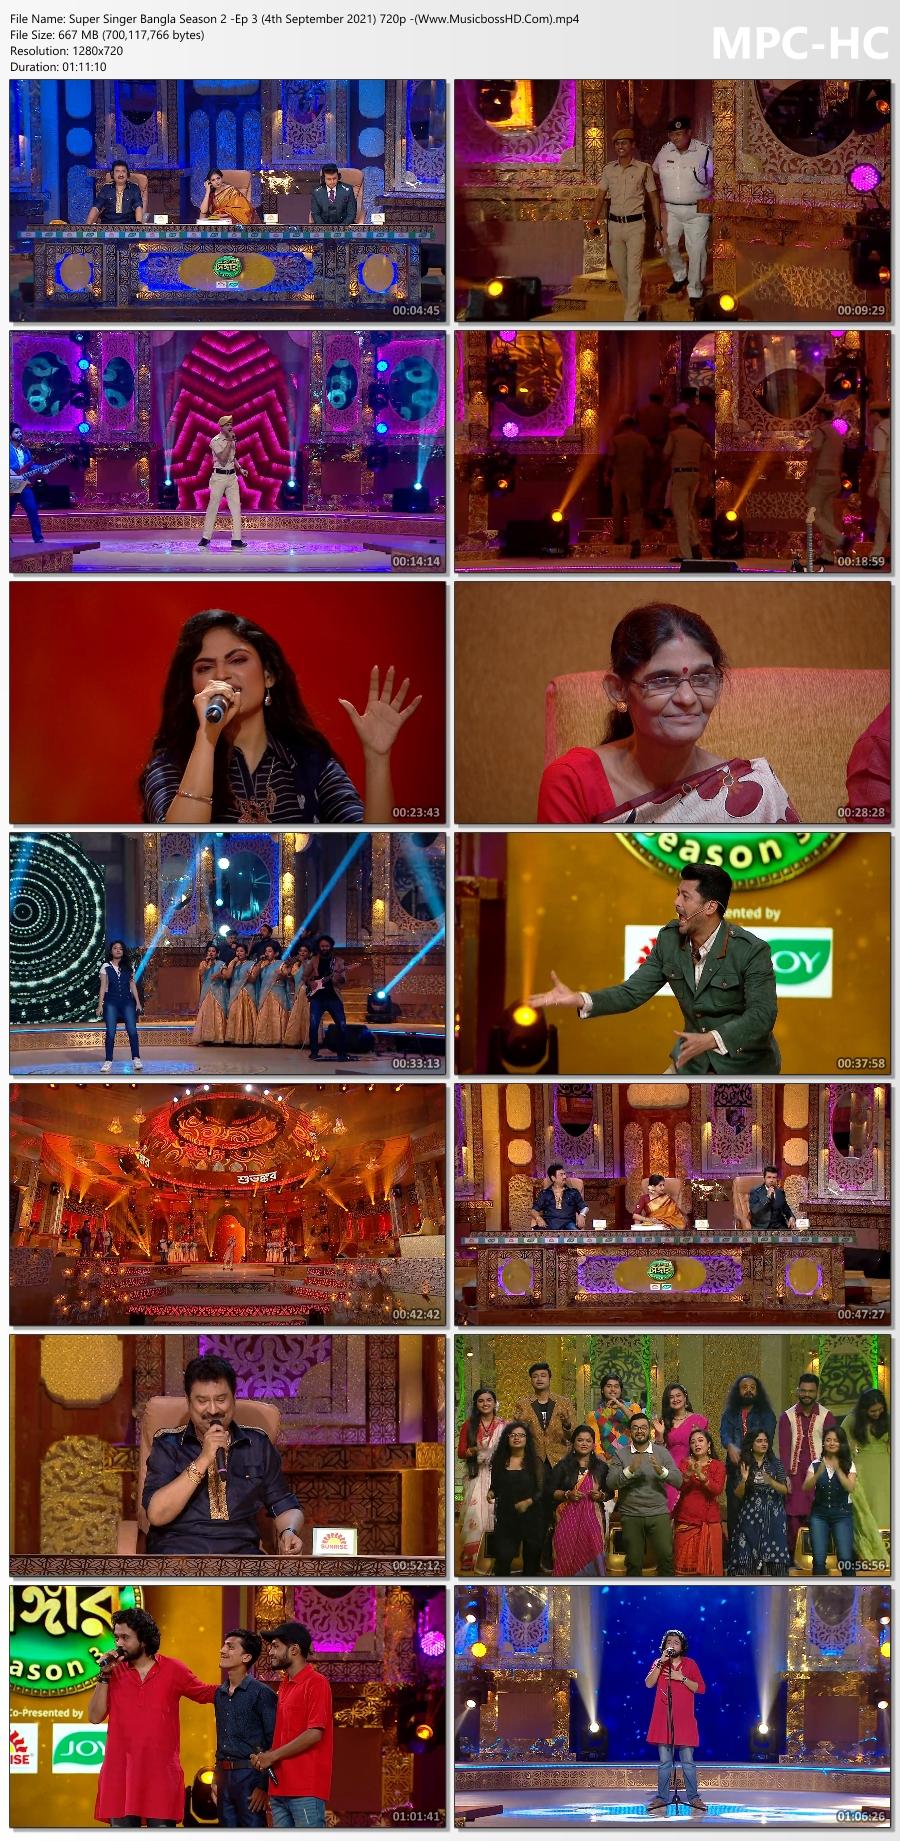 Super-Singer-Bangla-Season-2-Ep-3-4th-September-2021-720p-Www-Musicboss-HD-Com-mp4-thumbs